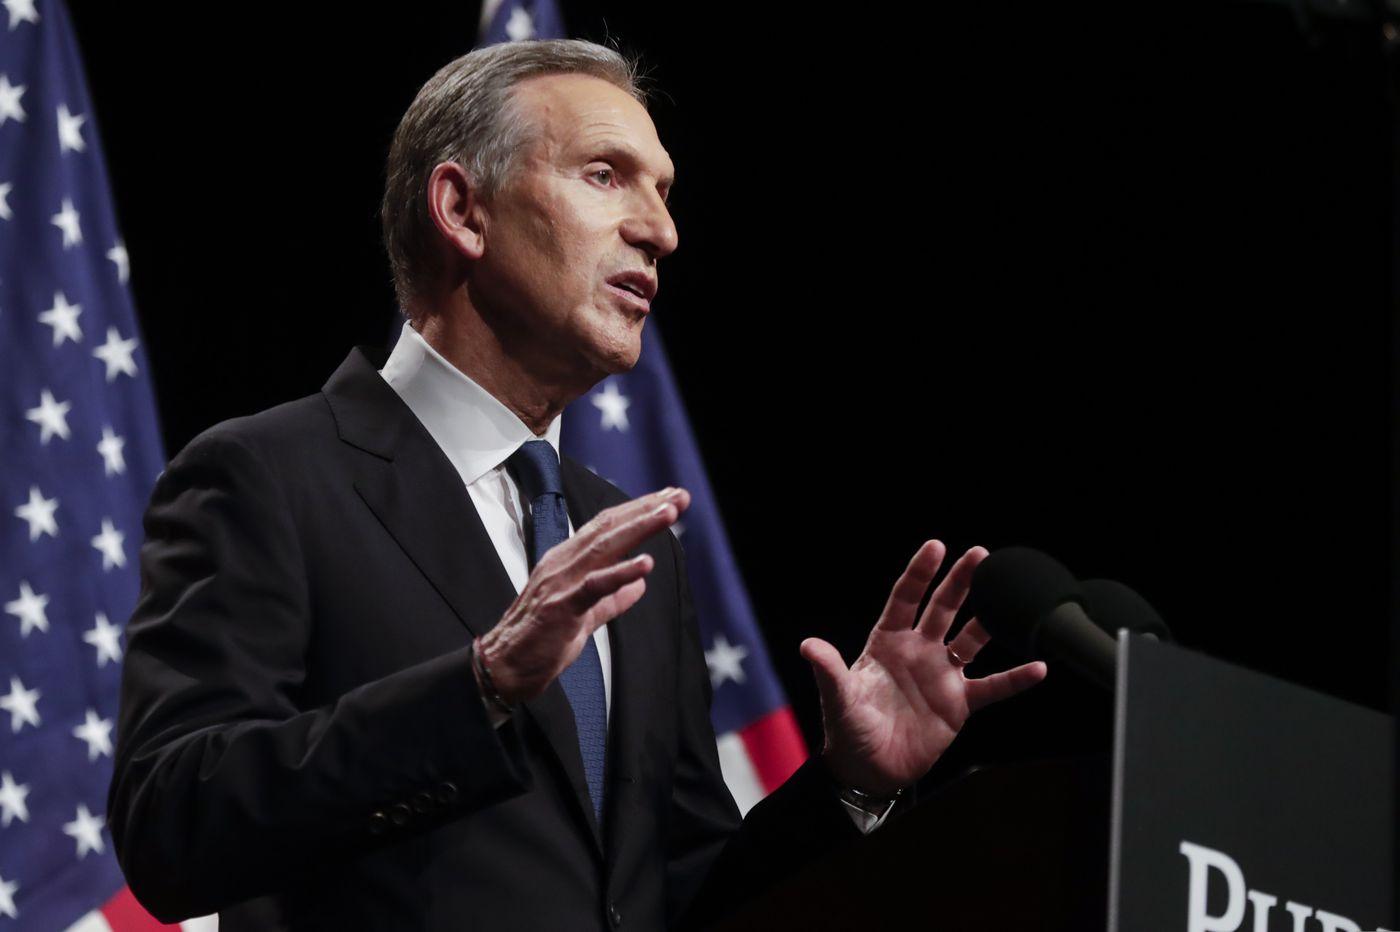 Mulling presidential bid, Howard Schultz again fails to vote